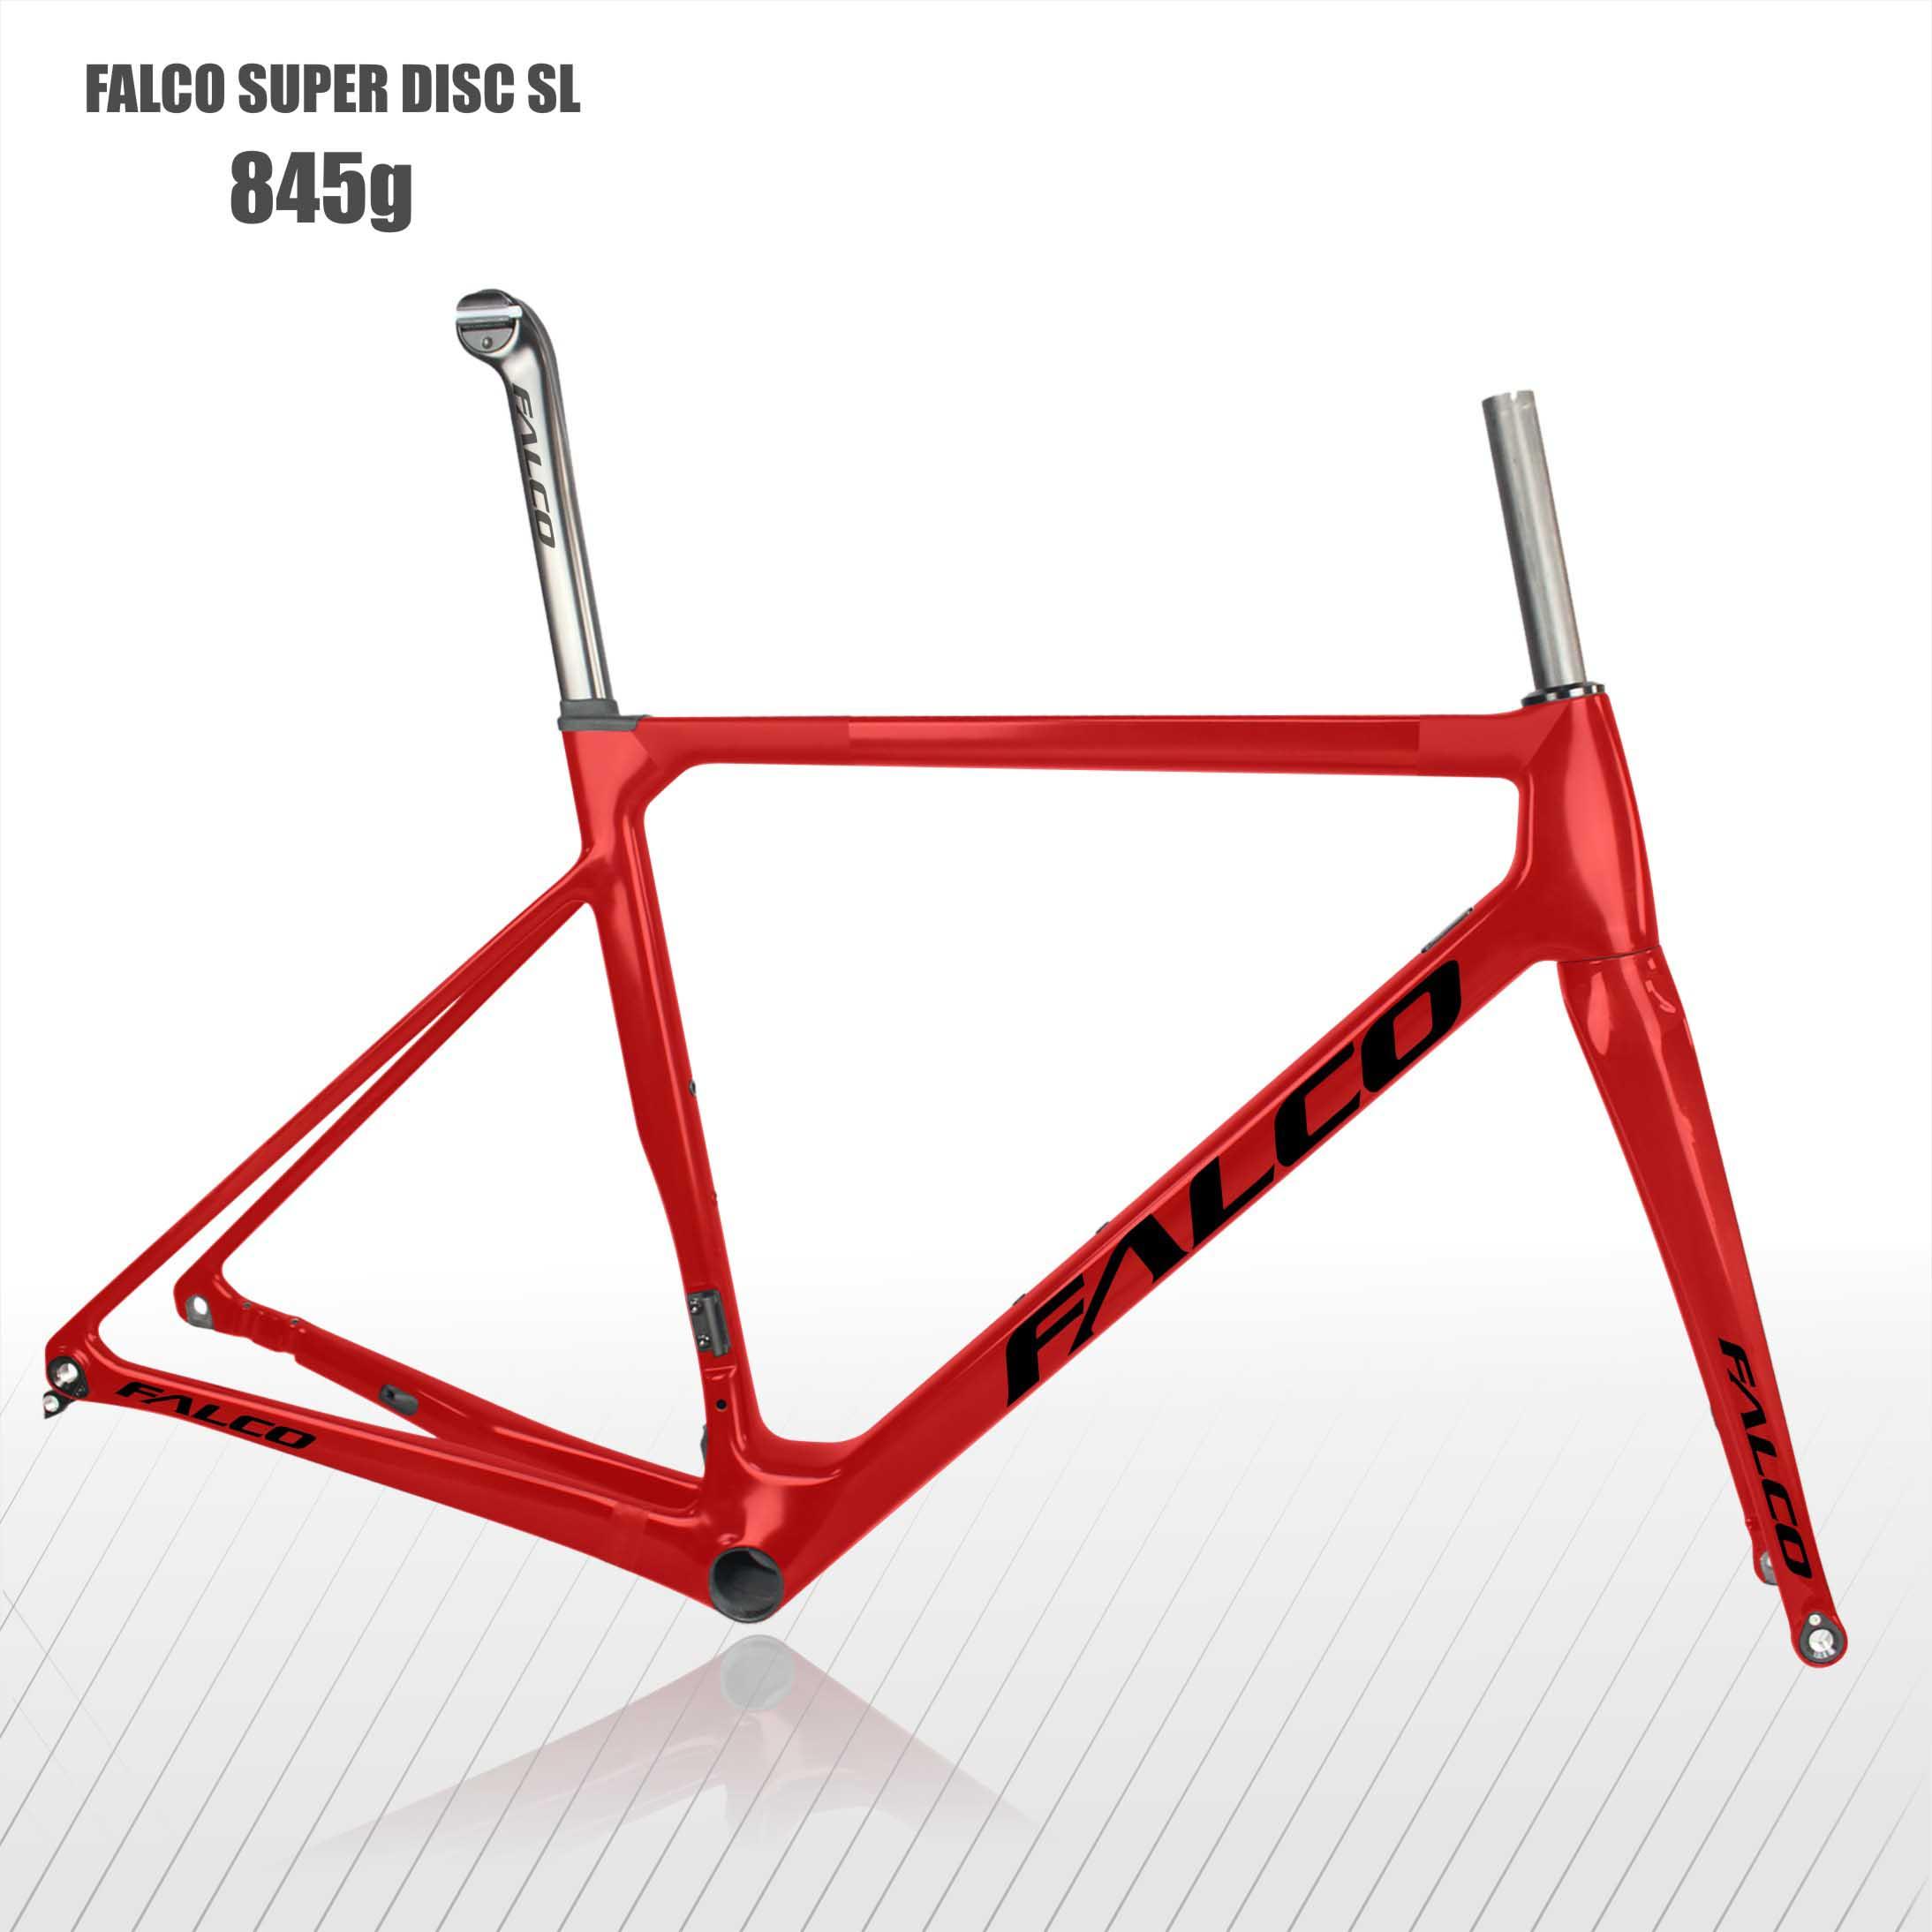 Falco Super Light Disc Road Bicycle Frame Set T1000 Tory Carbon Fiber,high Quality Full Carbon Disc Road Bike Frame